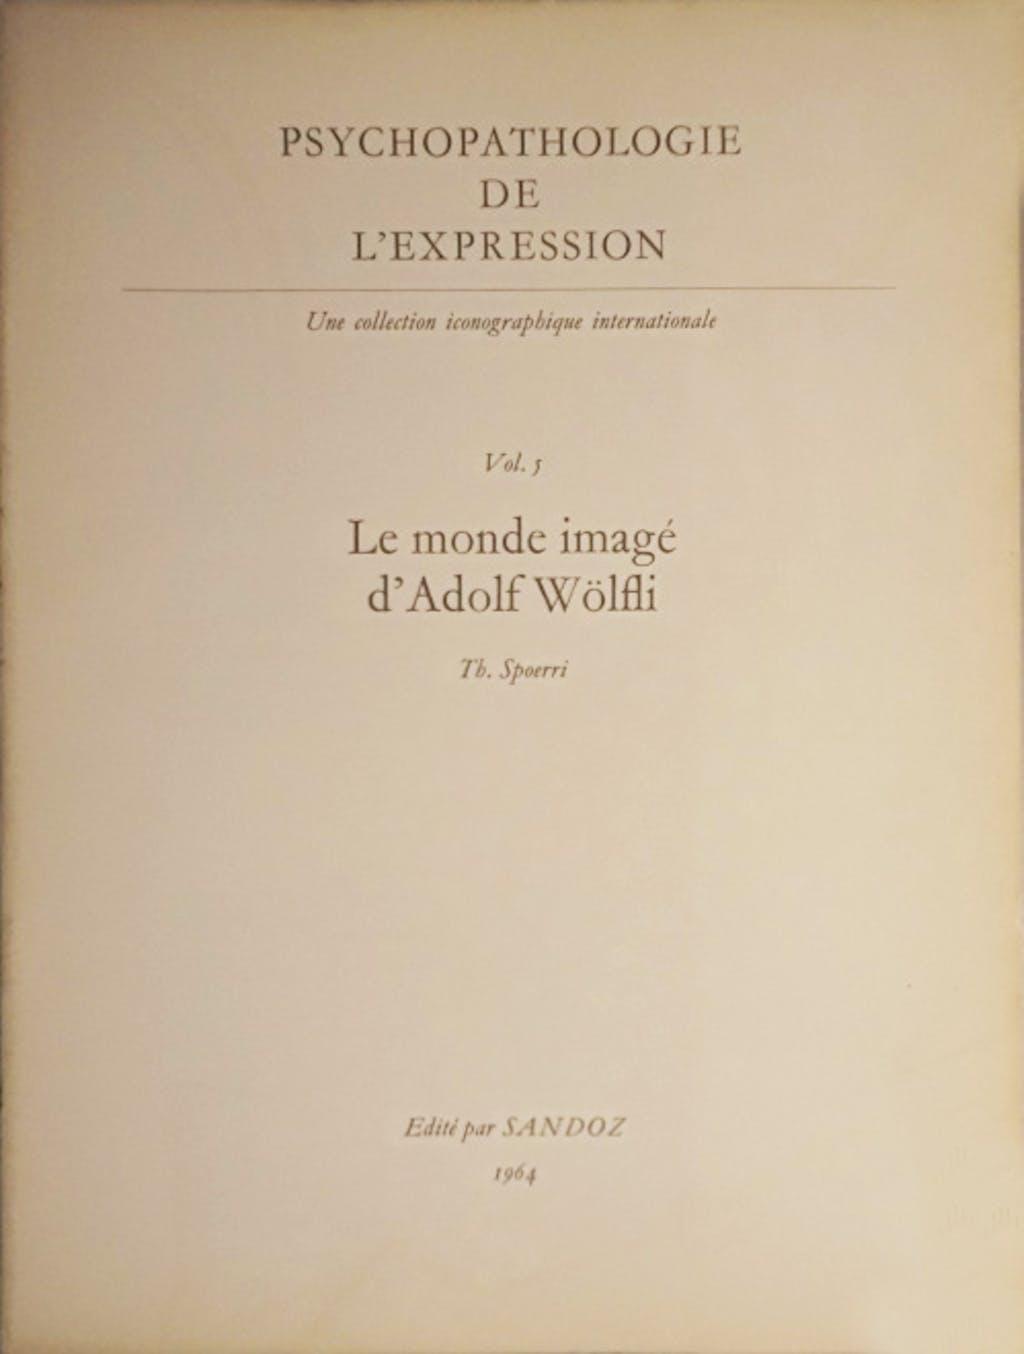 Psychopathologie de l'expression n°5 - © christian berst — art brut